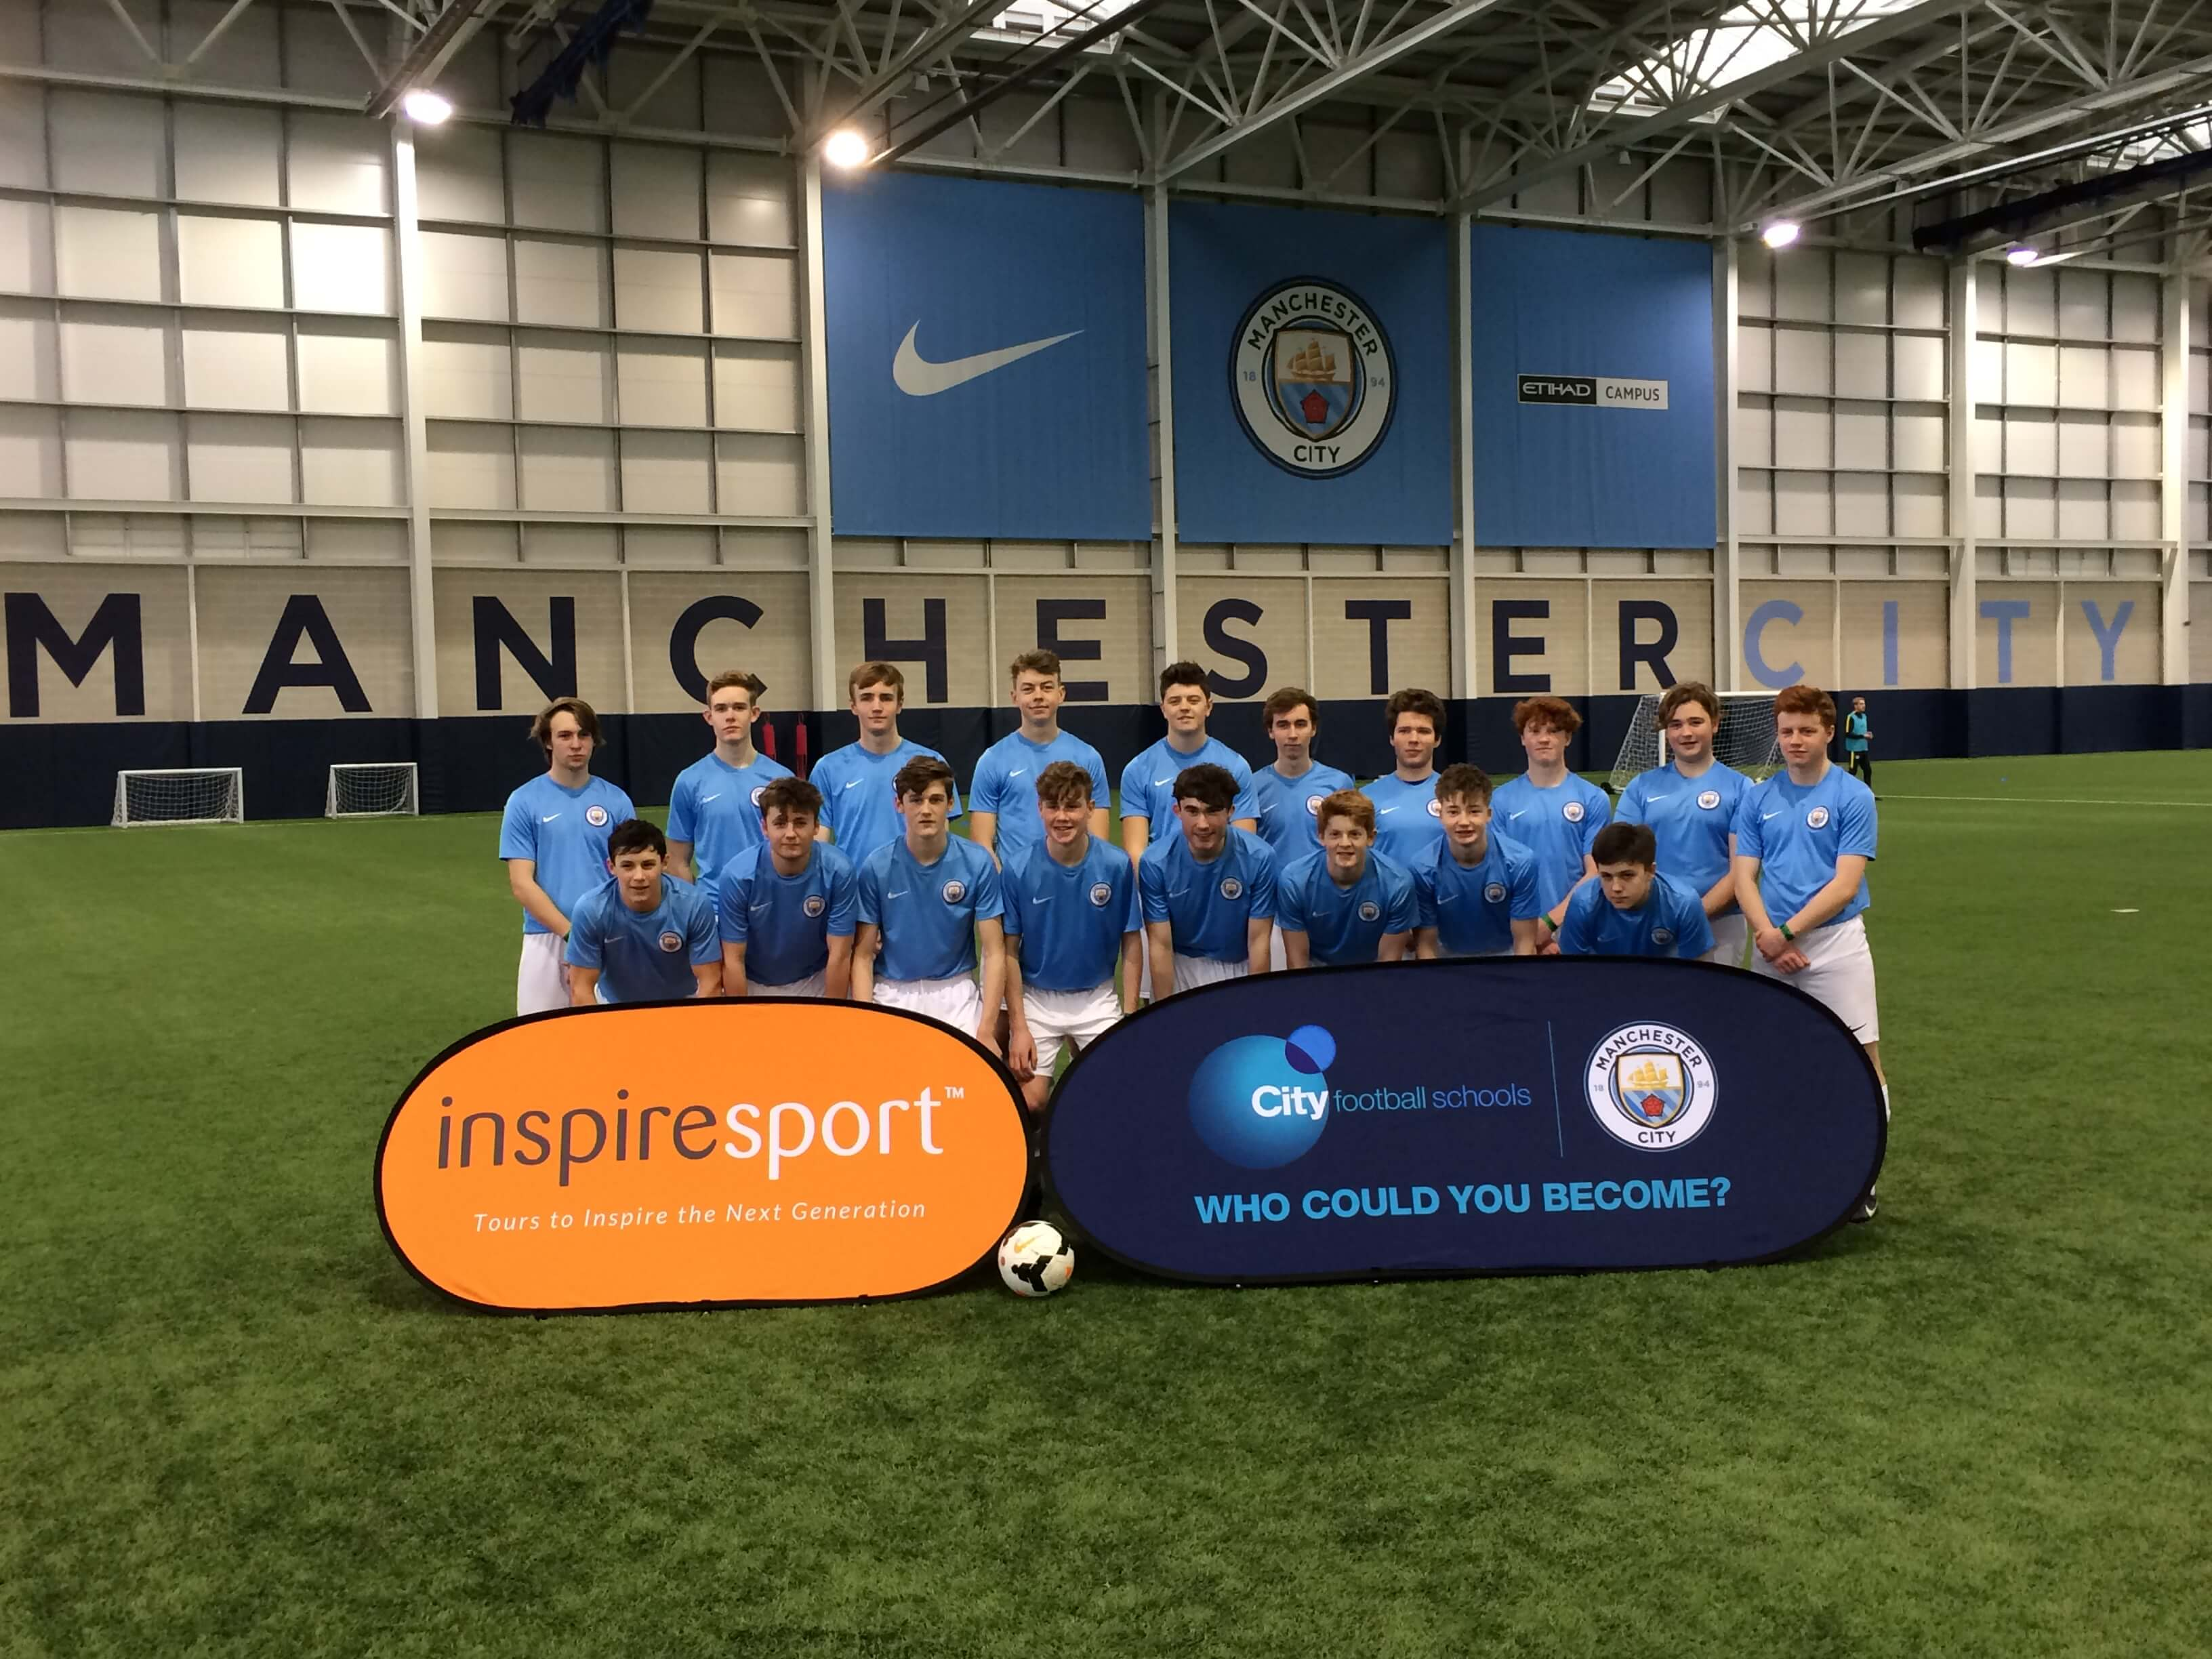 Man City inspiresport tour